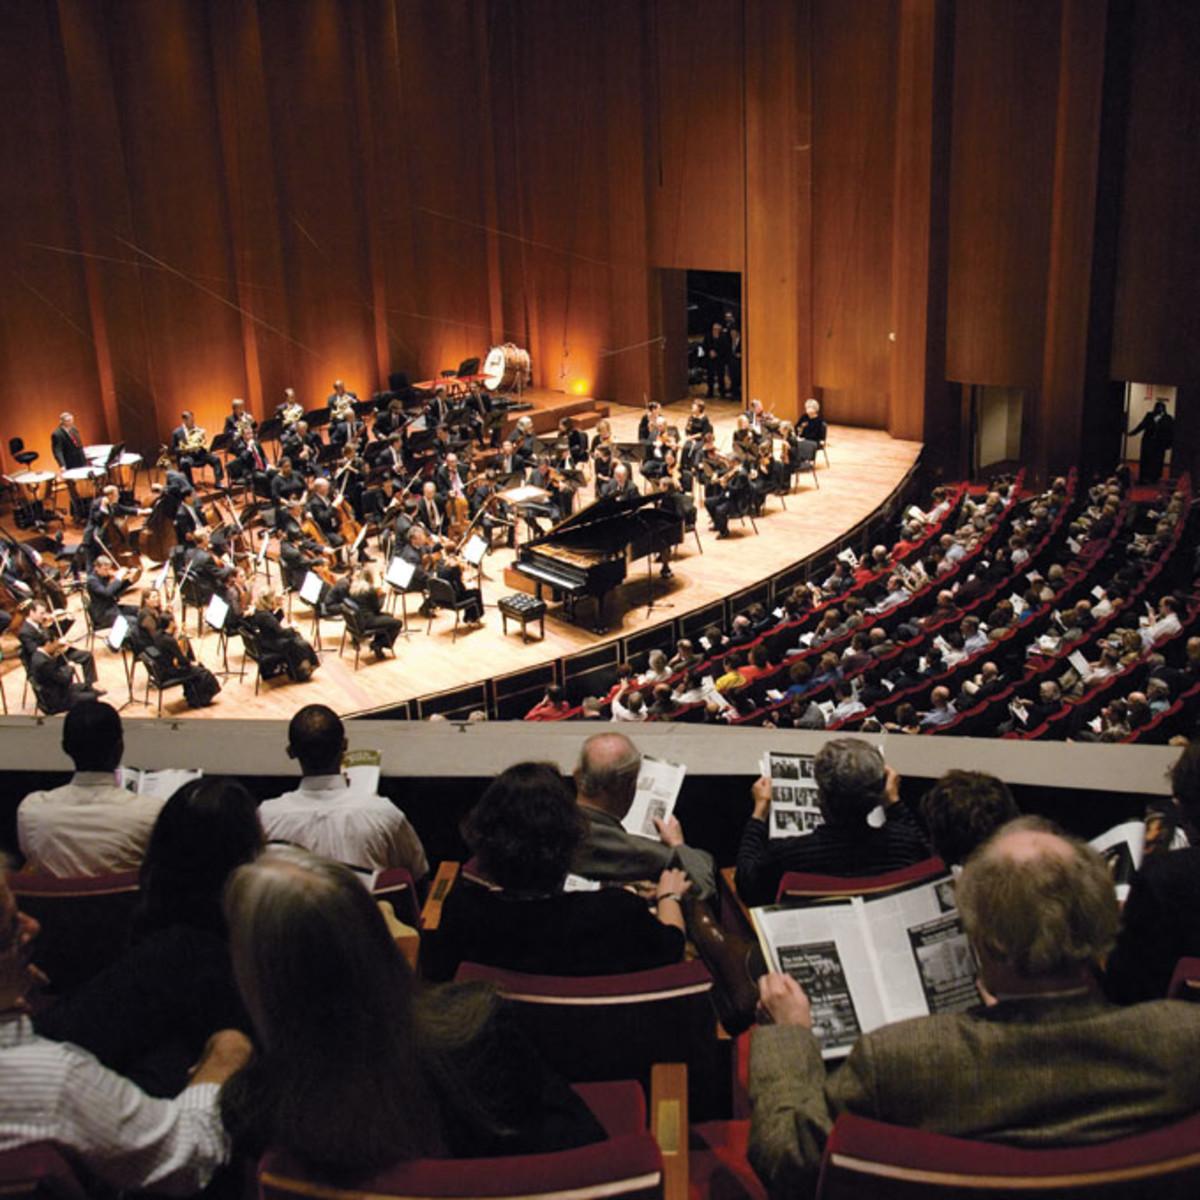 Places-A&E-Jones Hall-Houston Symphony-performance-1